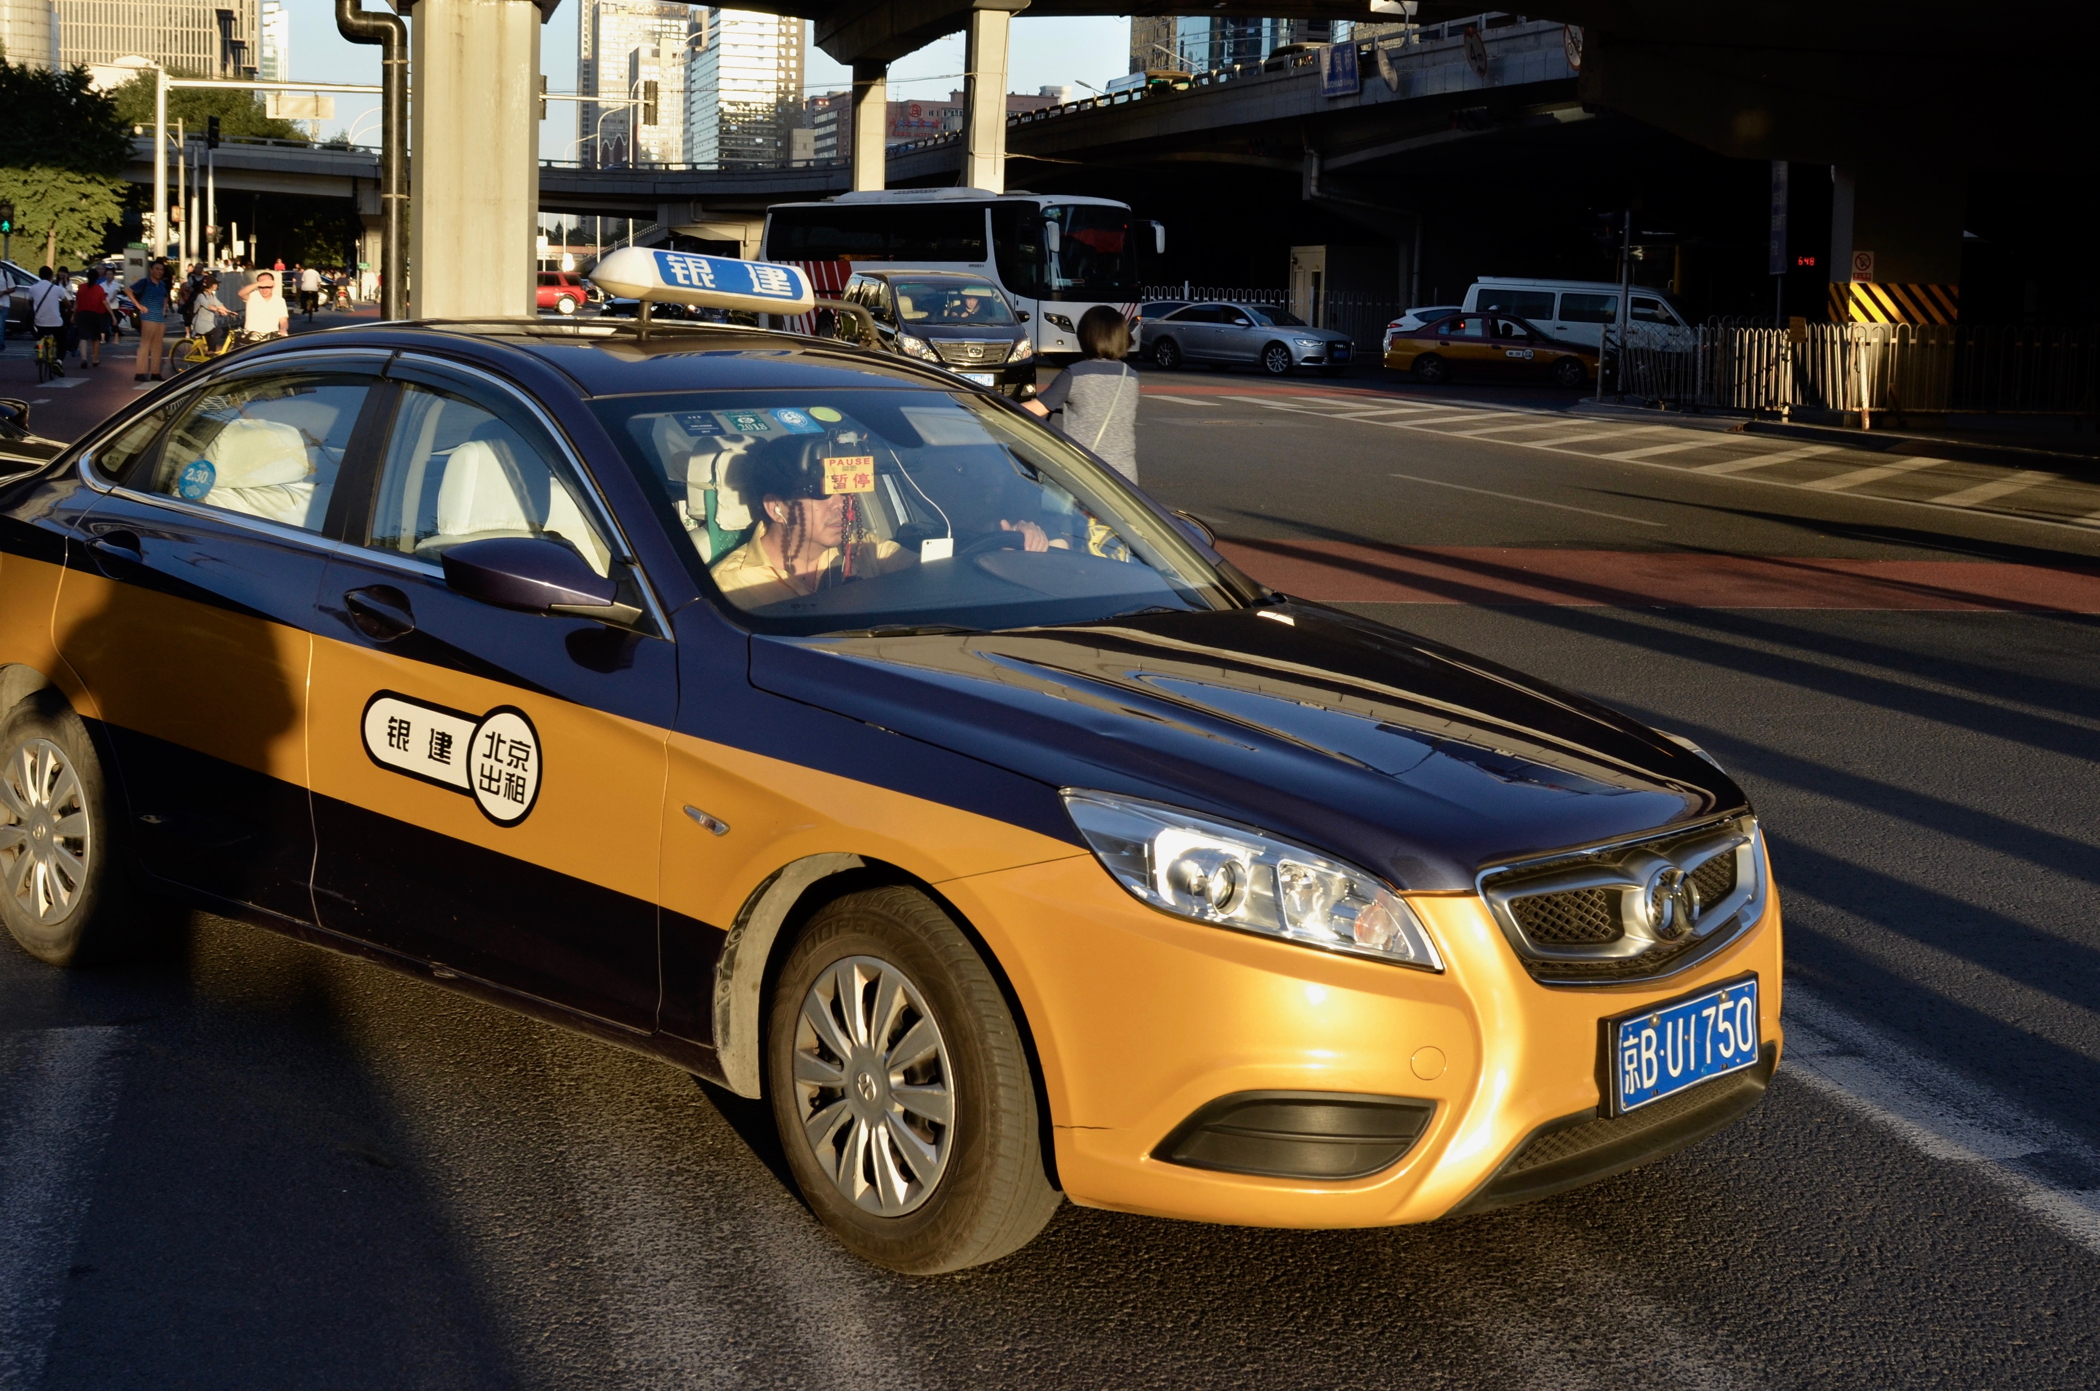 peking-tipps-taxifahren-taxi